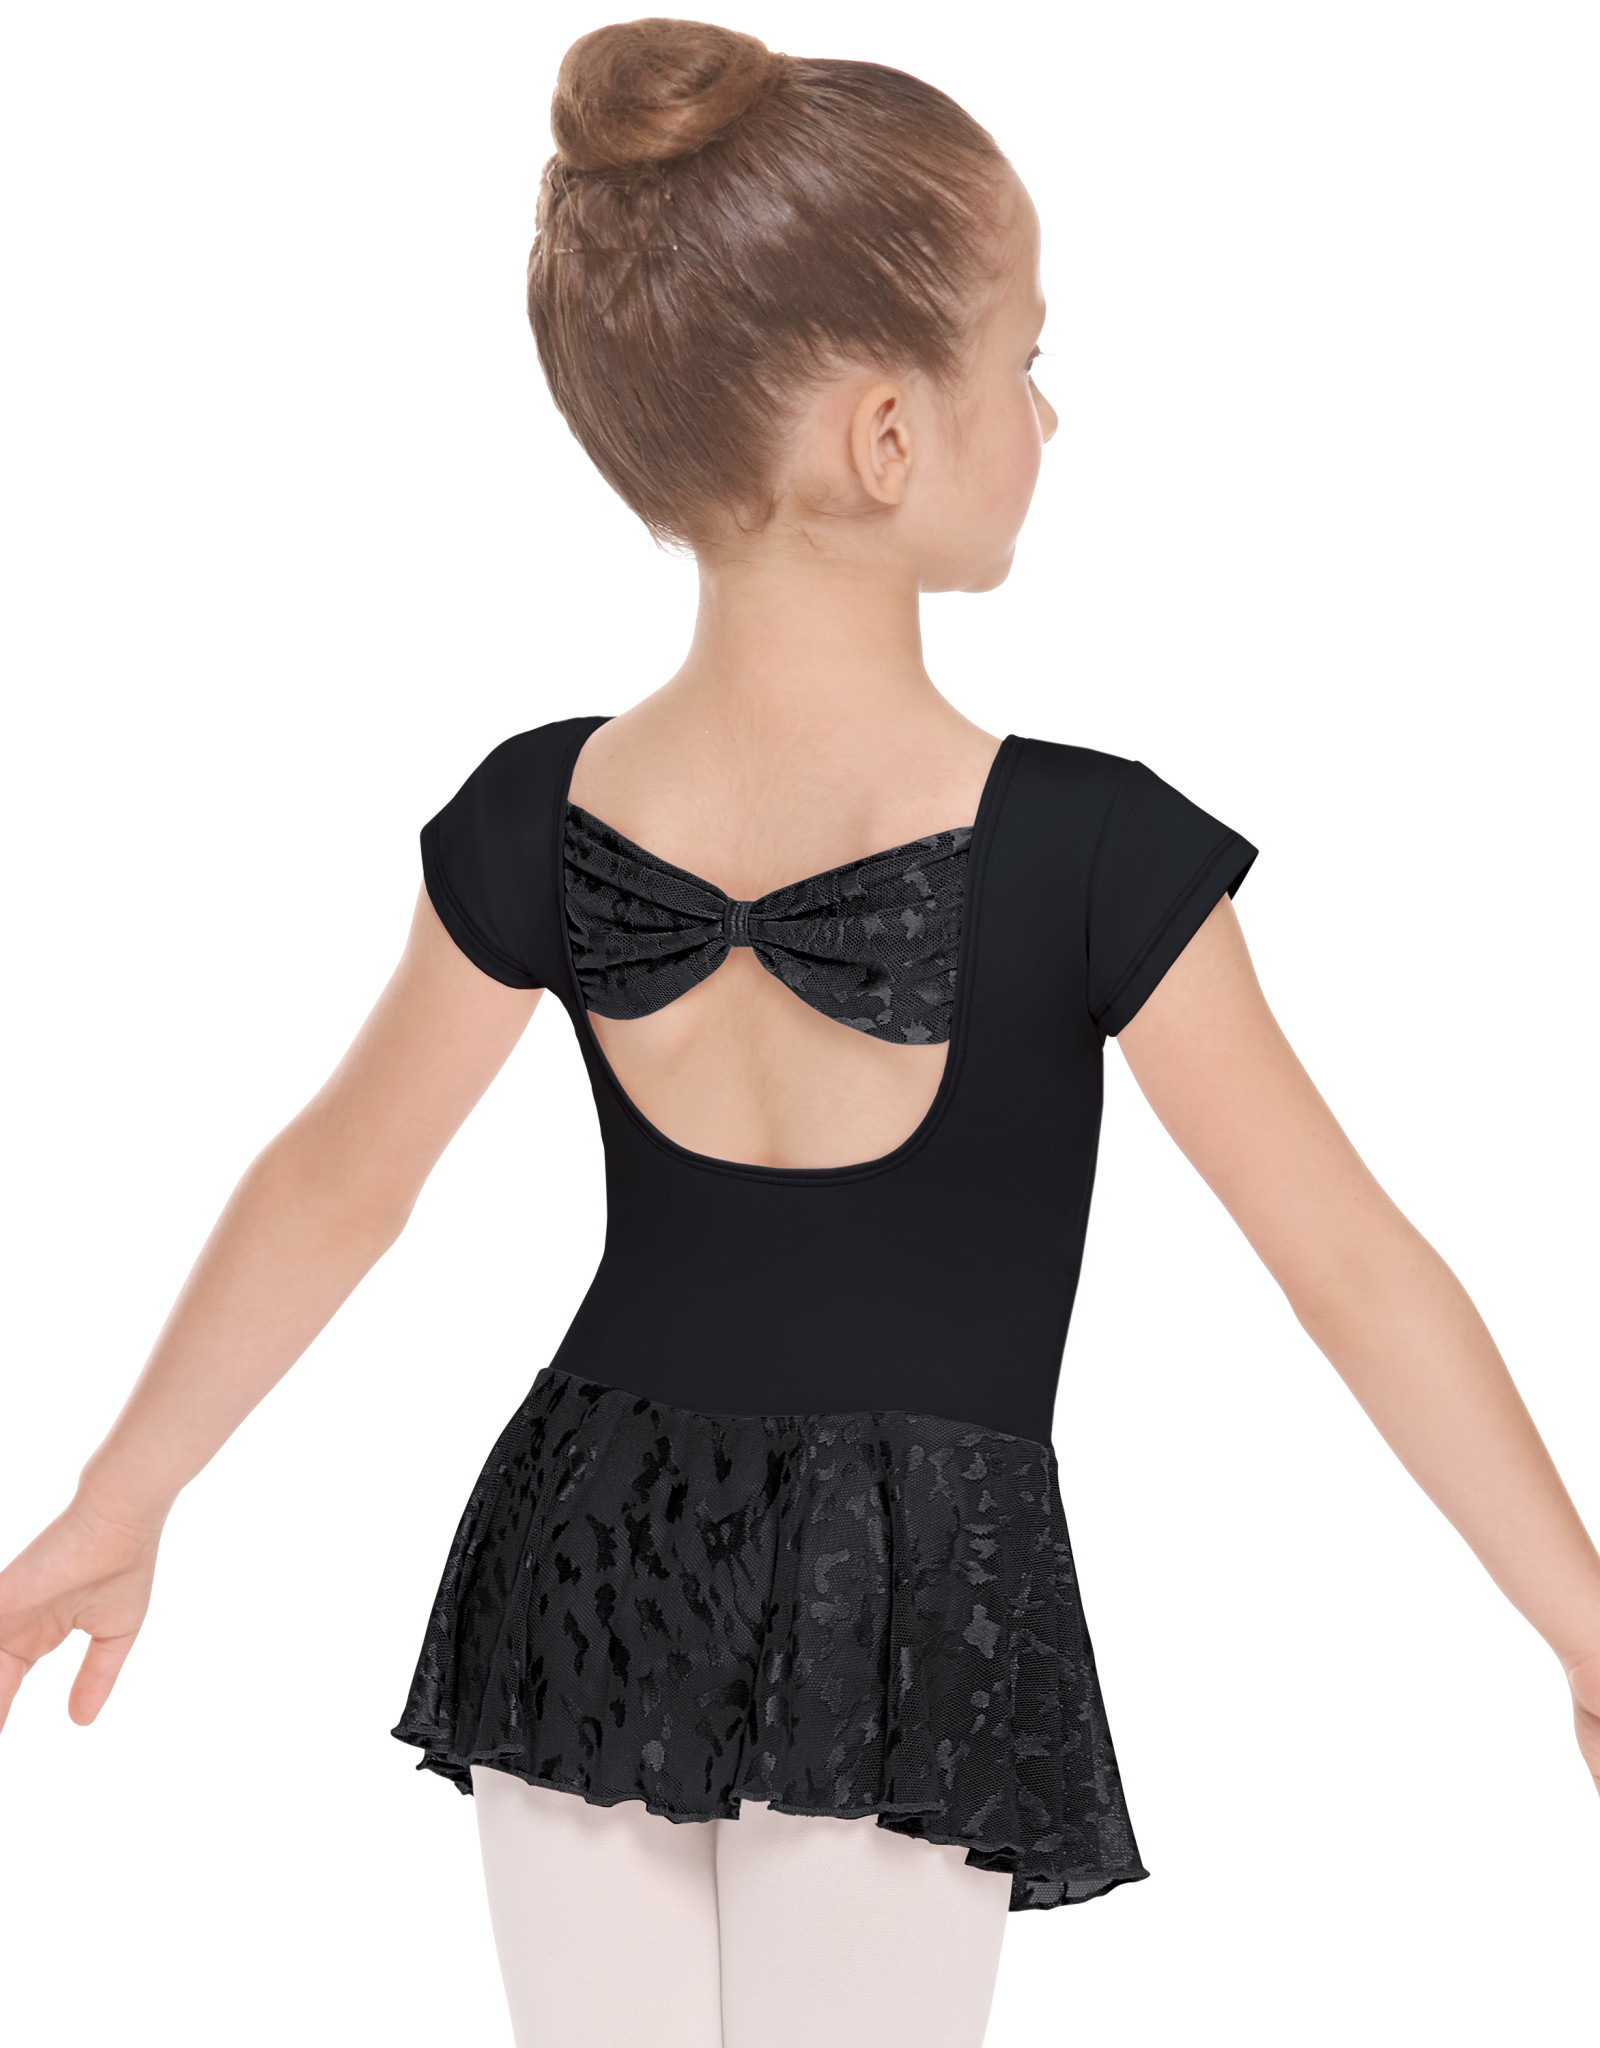 Eurotard 78285 Girls Mesh Bow Back Short Sleeve Dance Dress